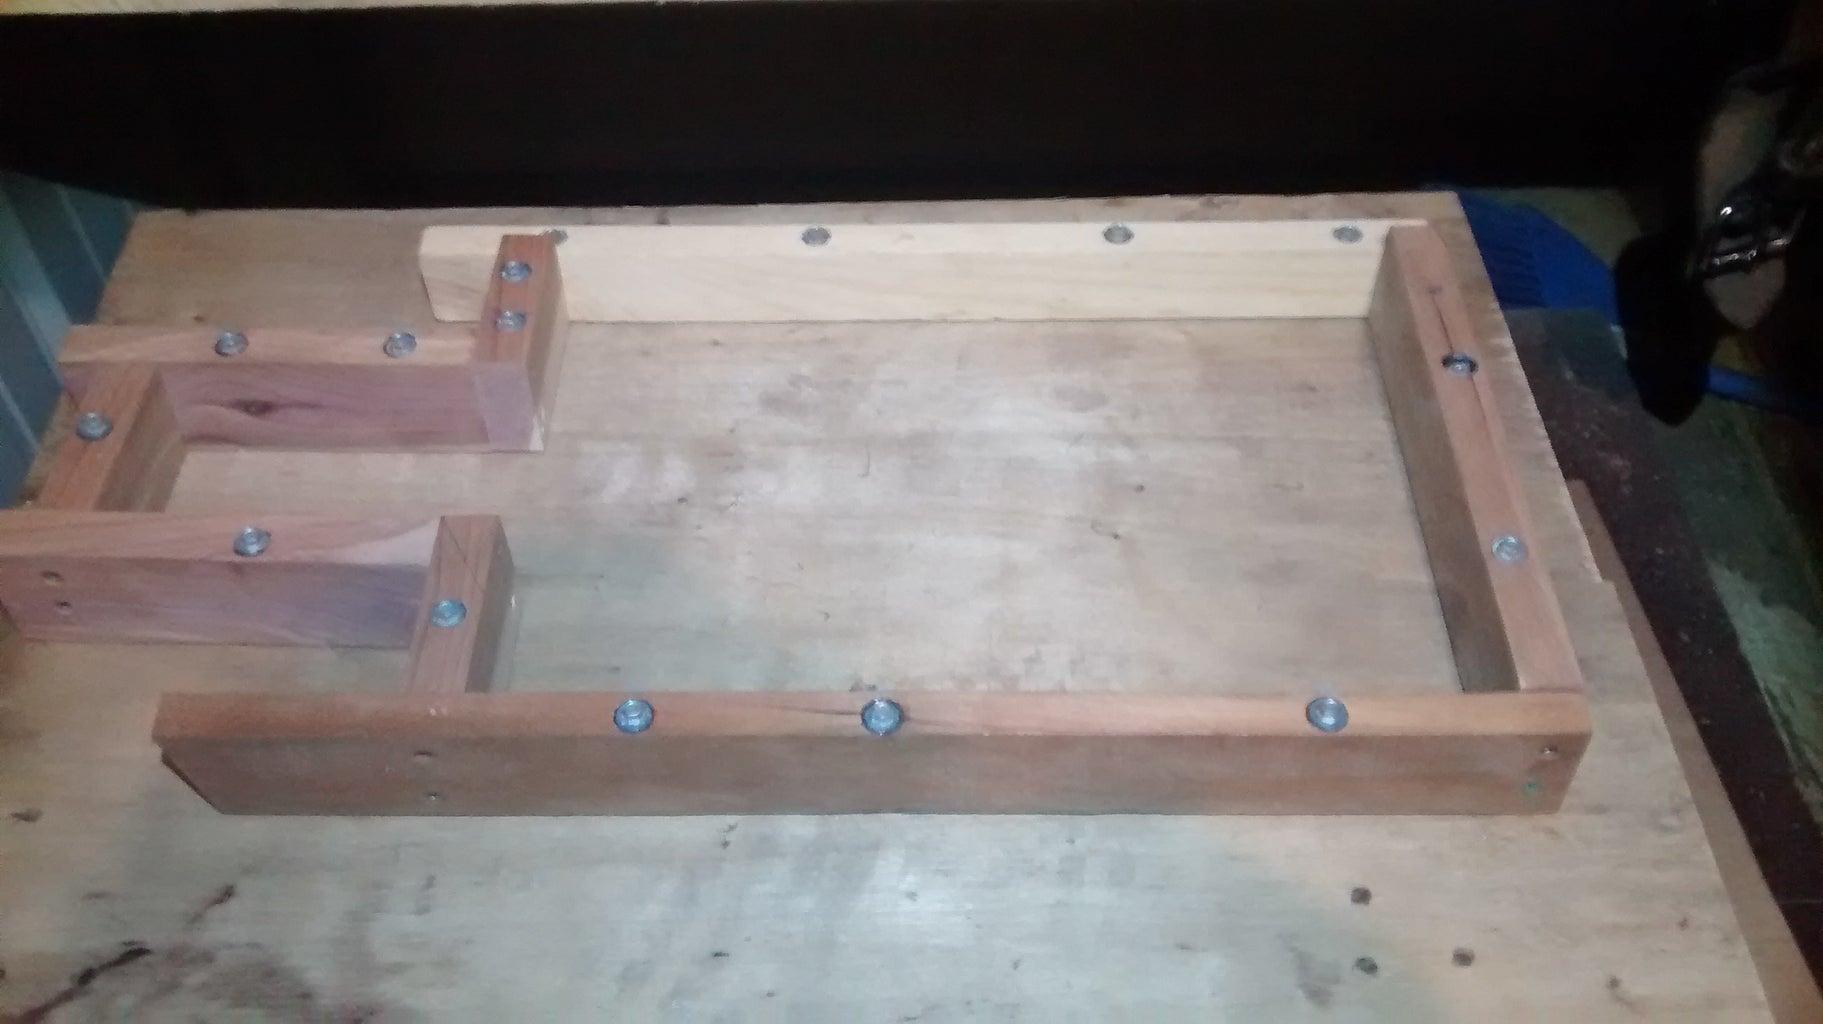 The Cutting Board Frame